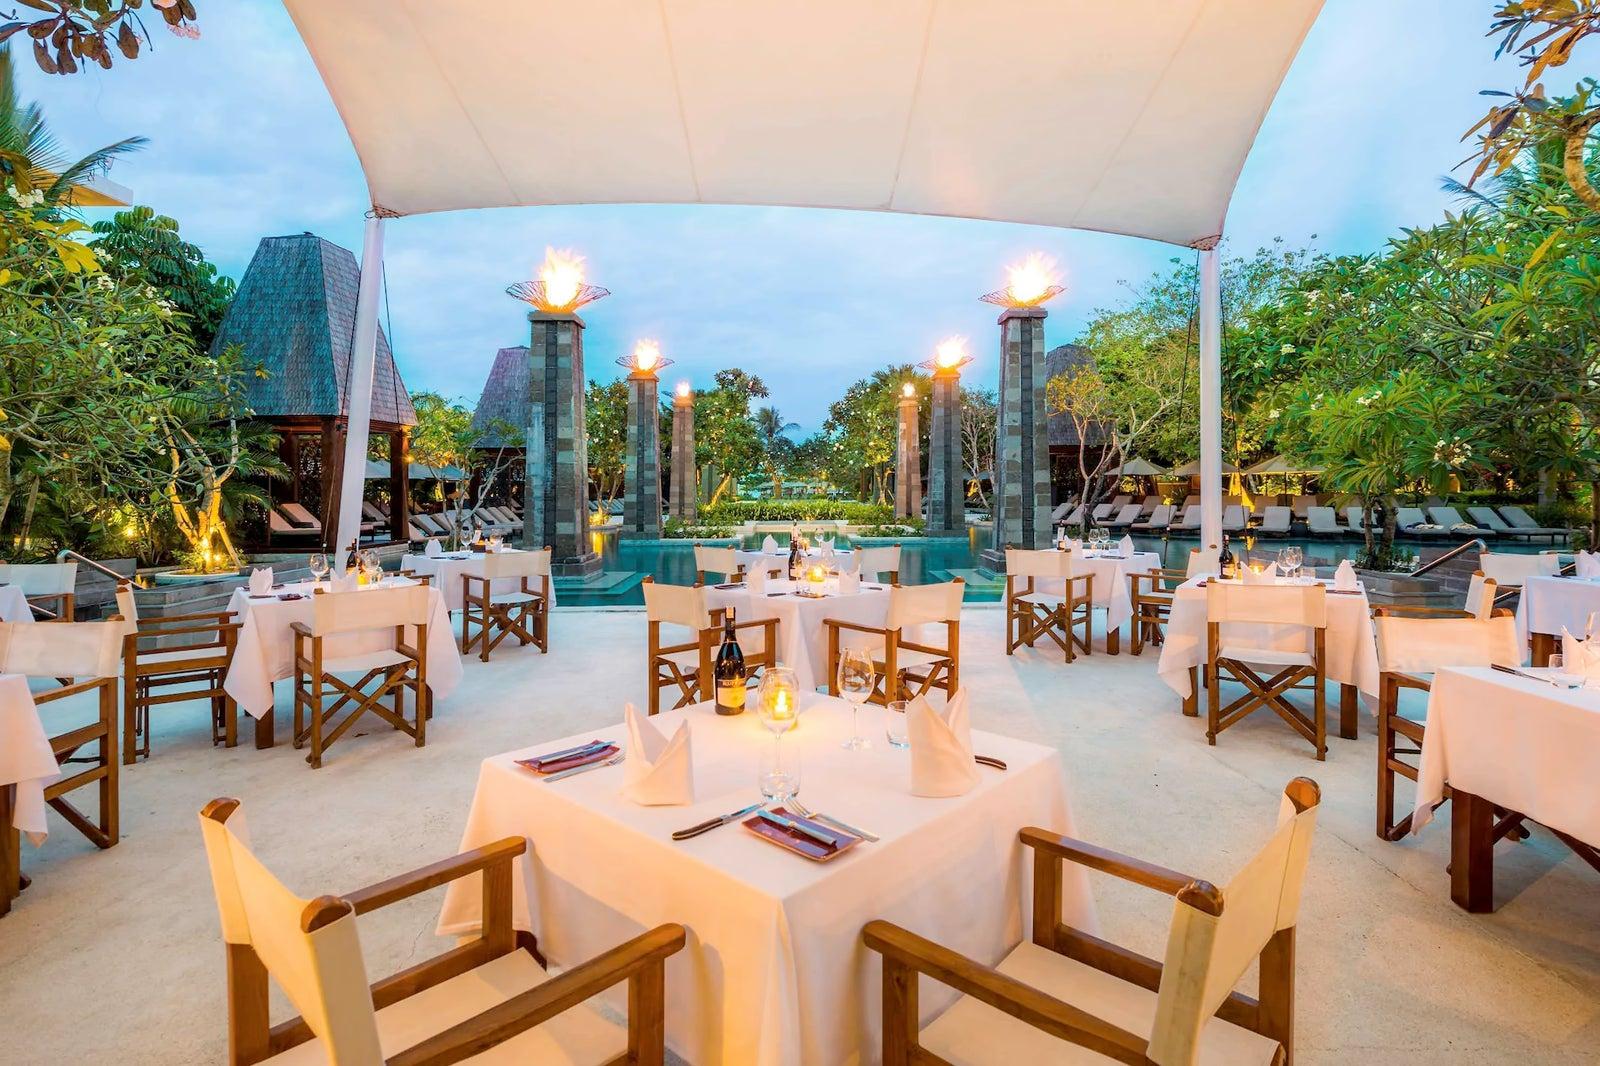 10 Best Restaurants in Nusa Dua - Where to Eat in Nusa Dua